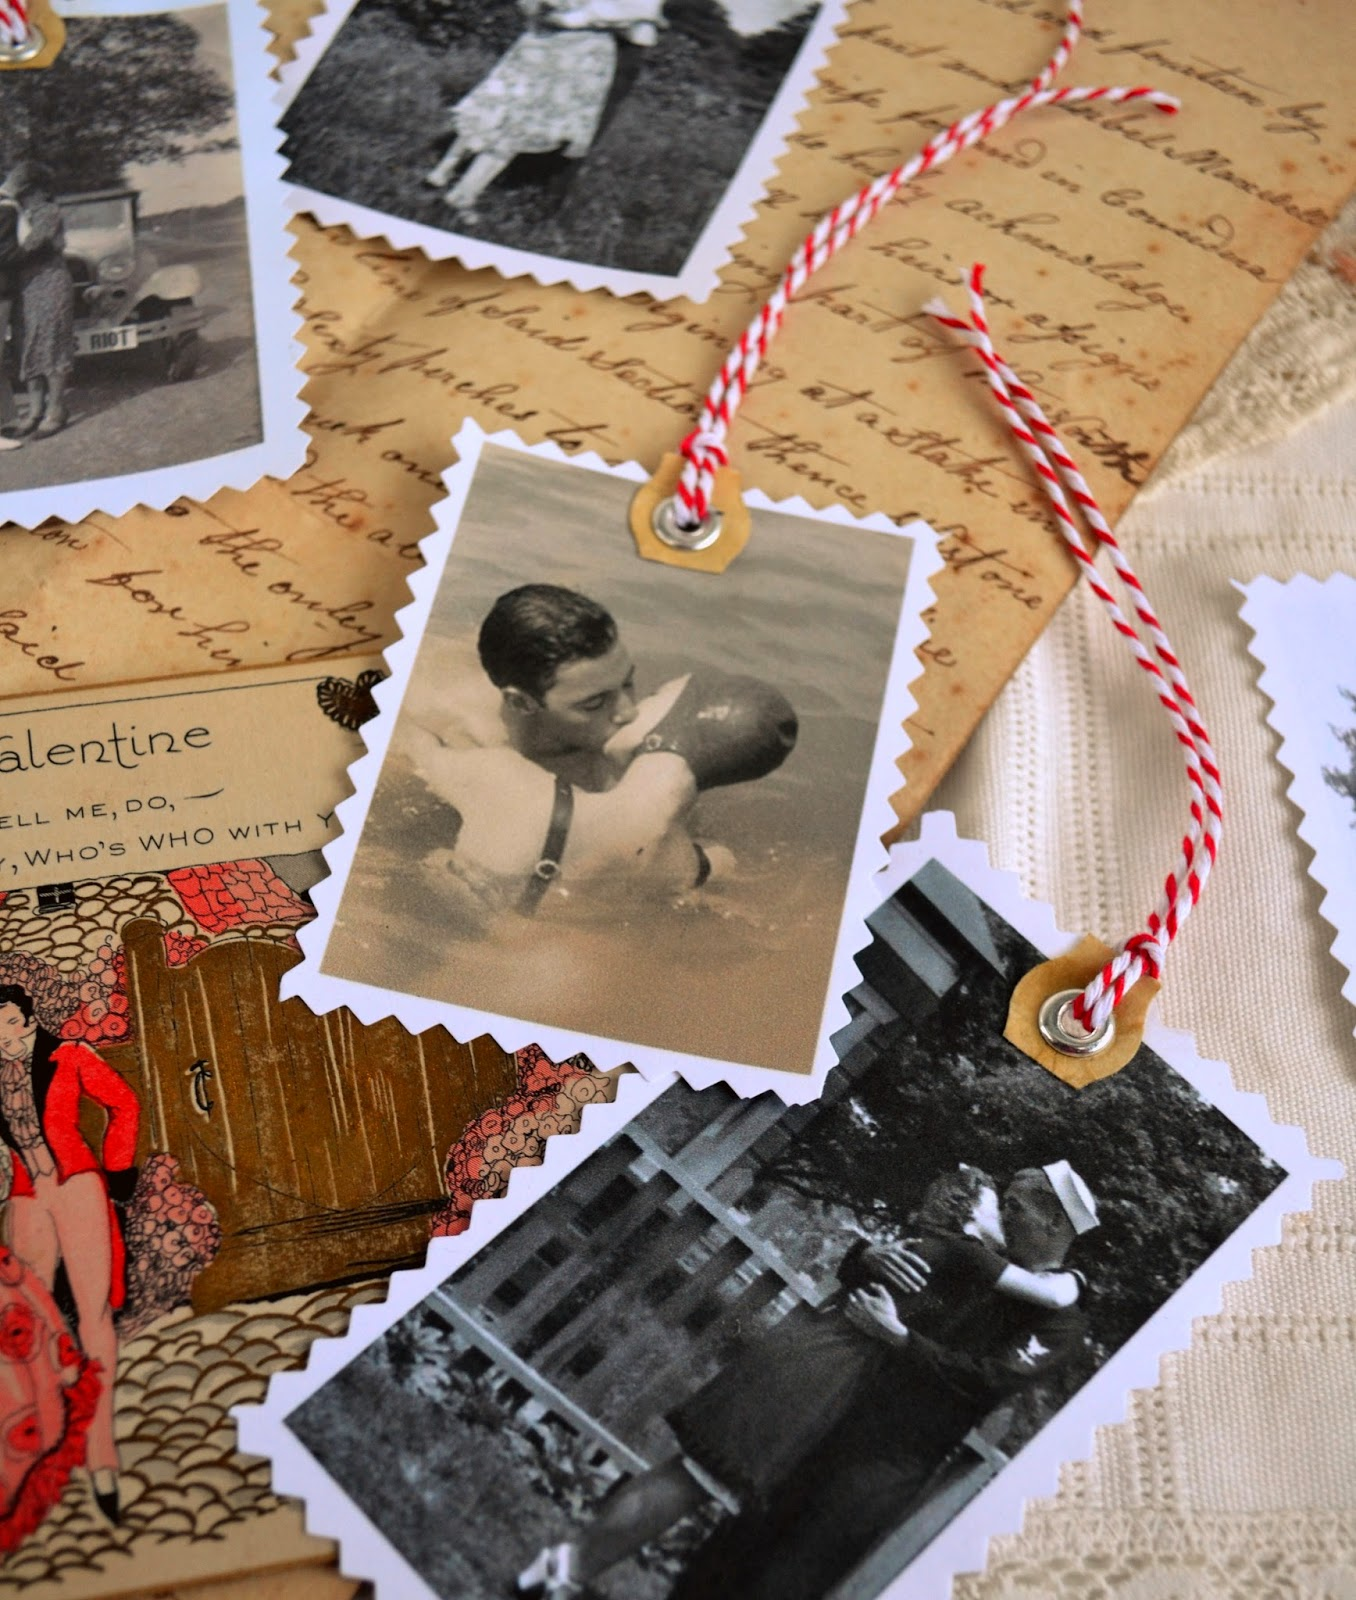 http://1.bp.blogspot.com/-nTf6WCkPYoM/UvLw_9bMMlI/AAAAAAAAZjM/HxAplv0E1aw/s1600/true+love's+kiss+valentine+gift+tags+vintage+photo+diy+rookno17-003.JPG